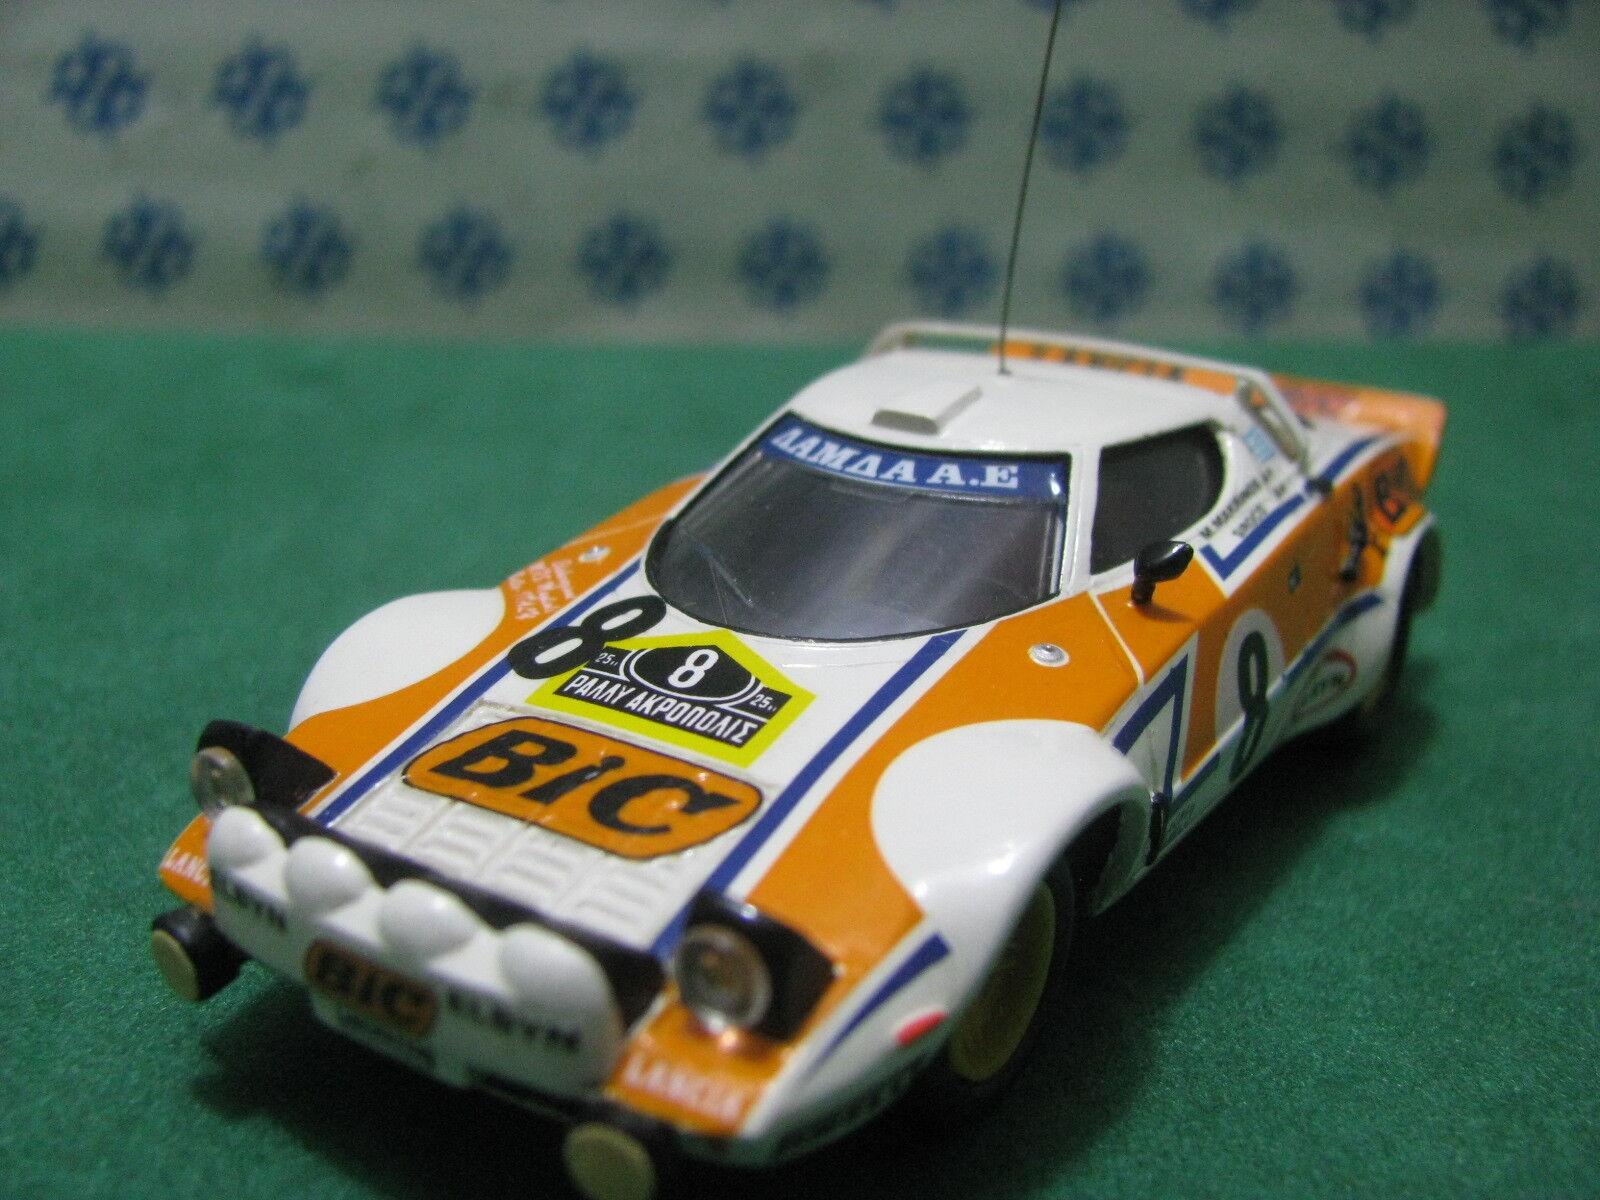 Vintage - LANCE STRATOS 8° Rally Grecia - 1 43 Elab. base Solido